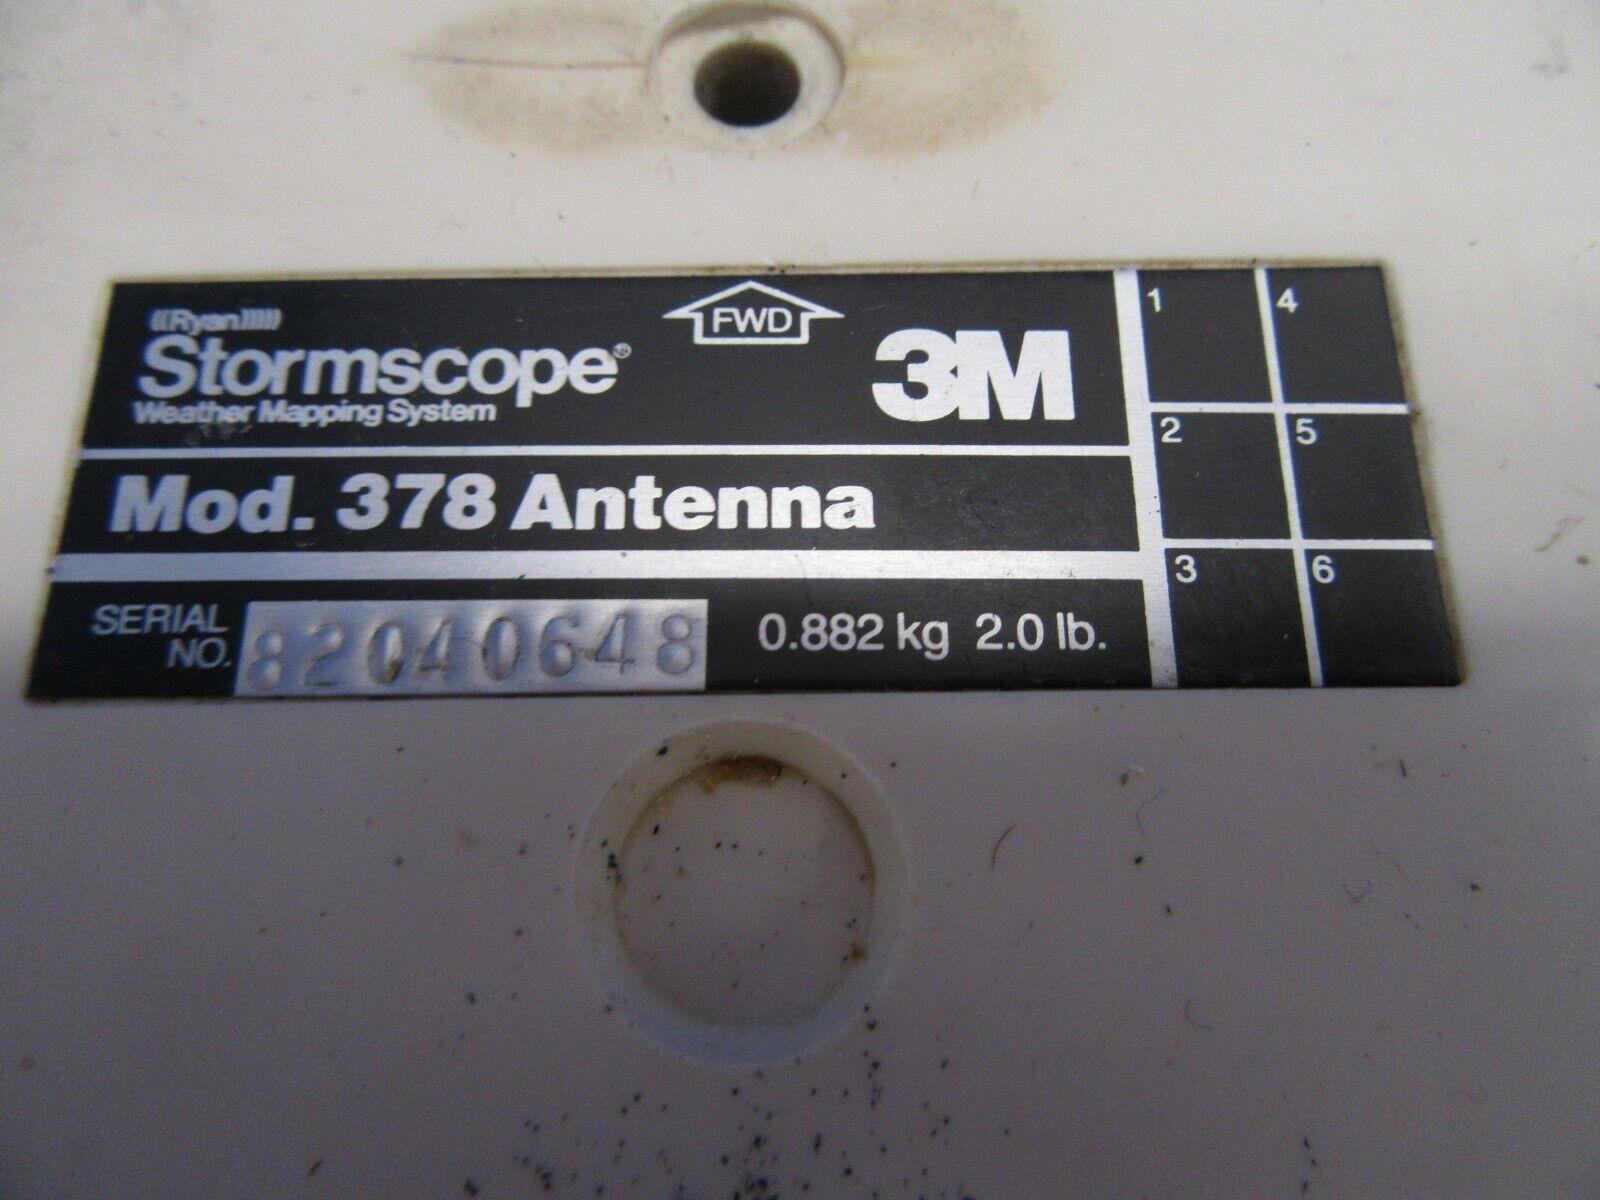 3M Stormscope Mod. 378 Antenna (0419-354)